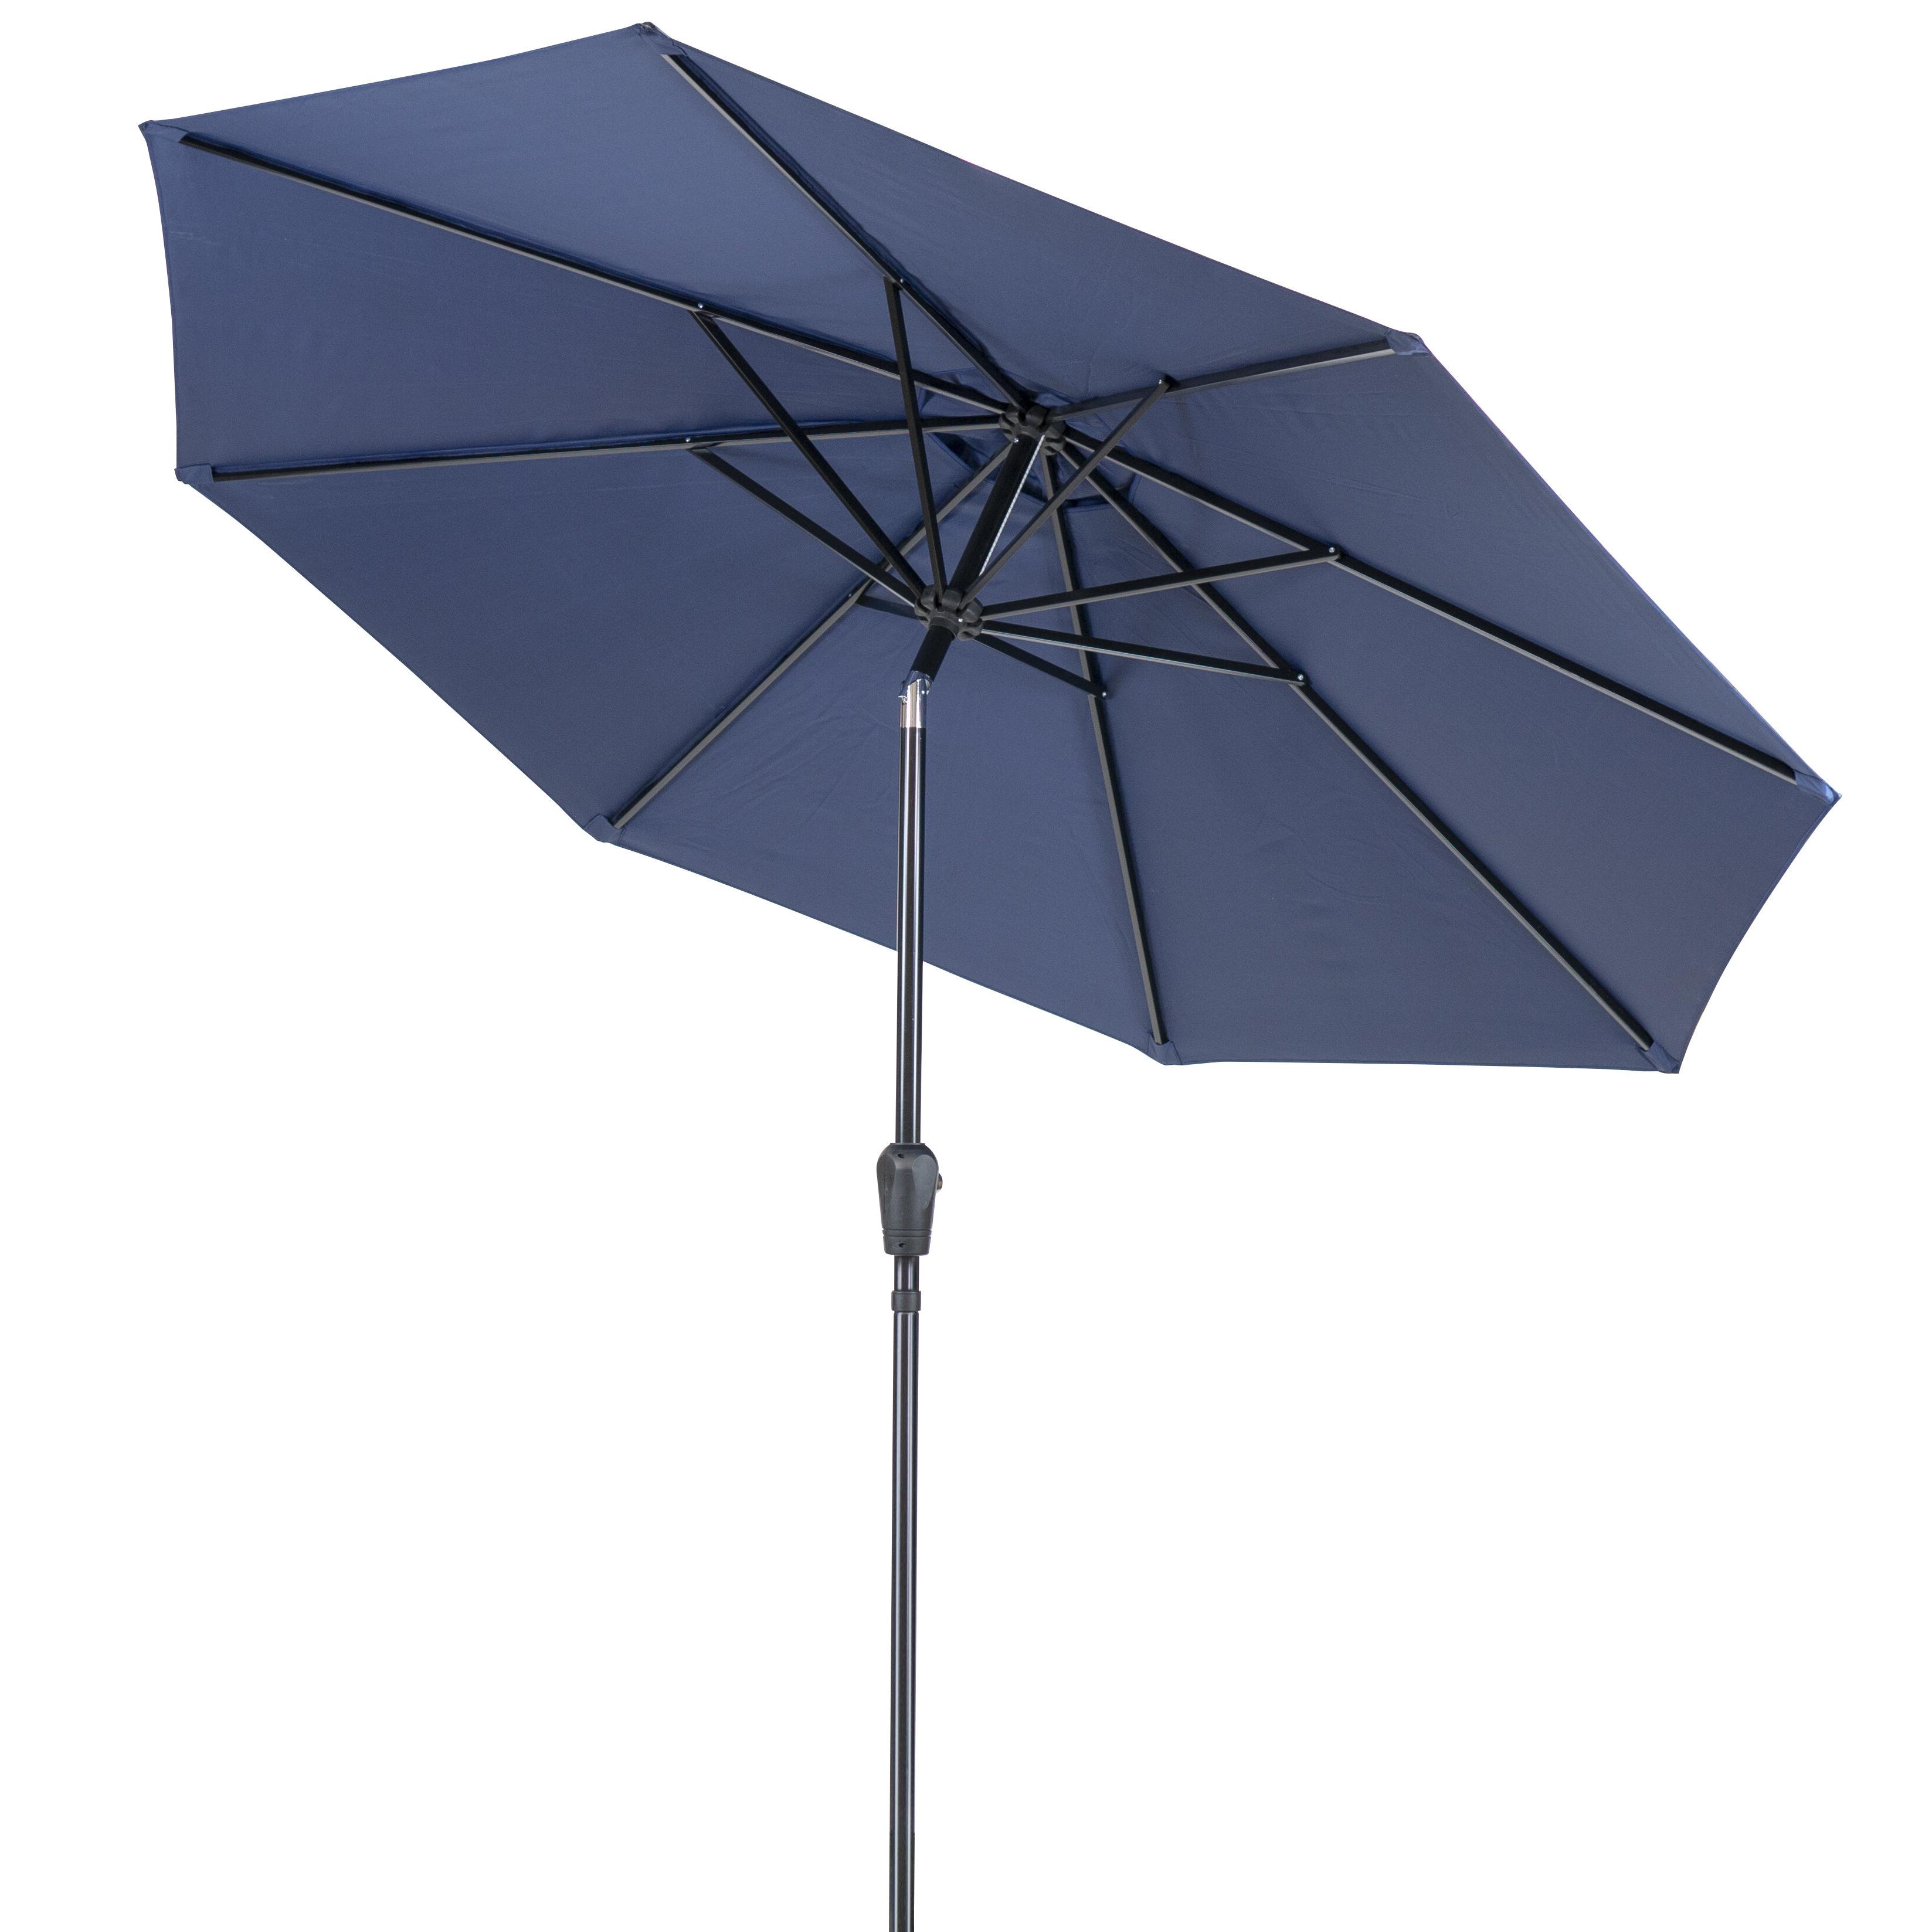 Most Recently Released Bricker Market Umbrellas In Patio Premier Round 9' Market Umbrella (Gallery 8 of 20)